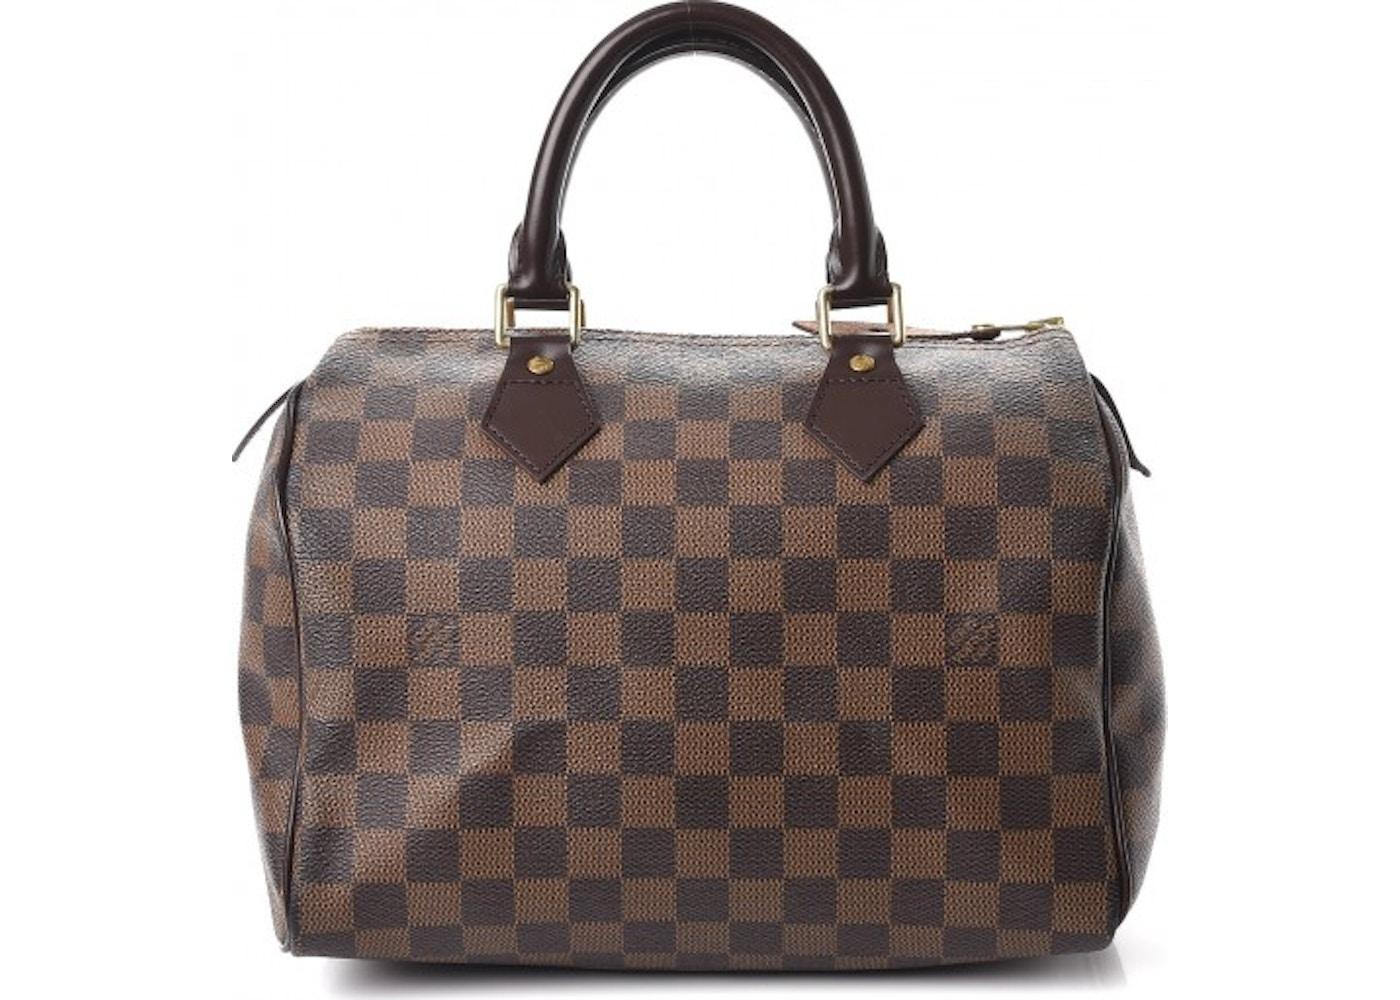 f680761e84384 Louis Vuitton Speedy Damier Ebene (Without Accessories) 25 Brown